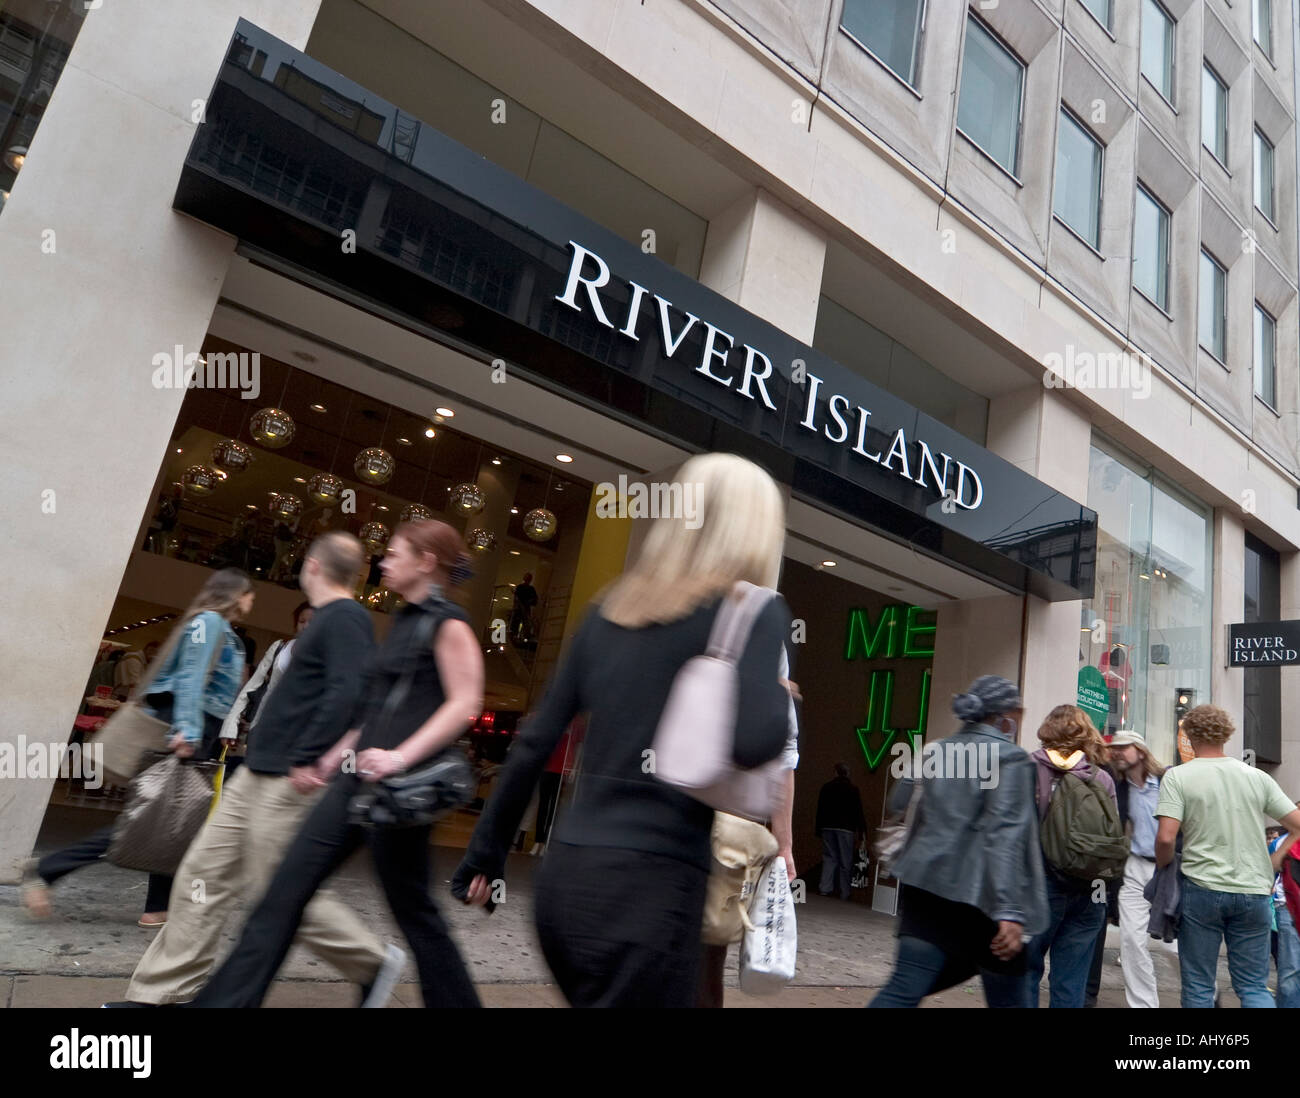 River Island store on Oxford Street London Stock Photo